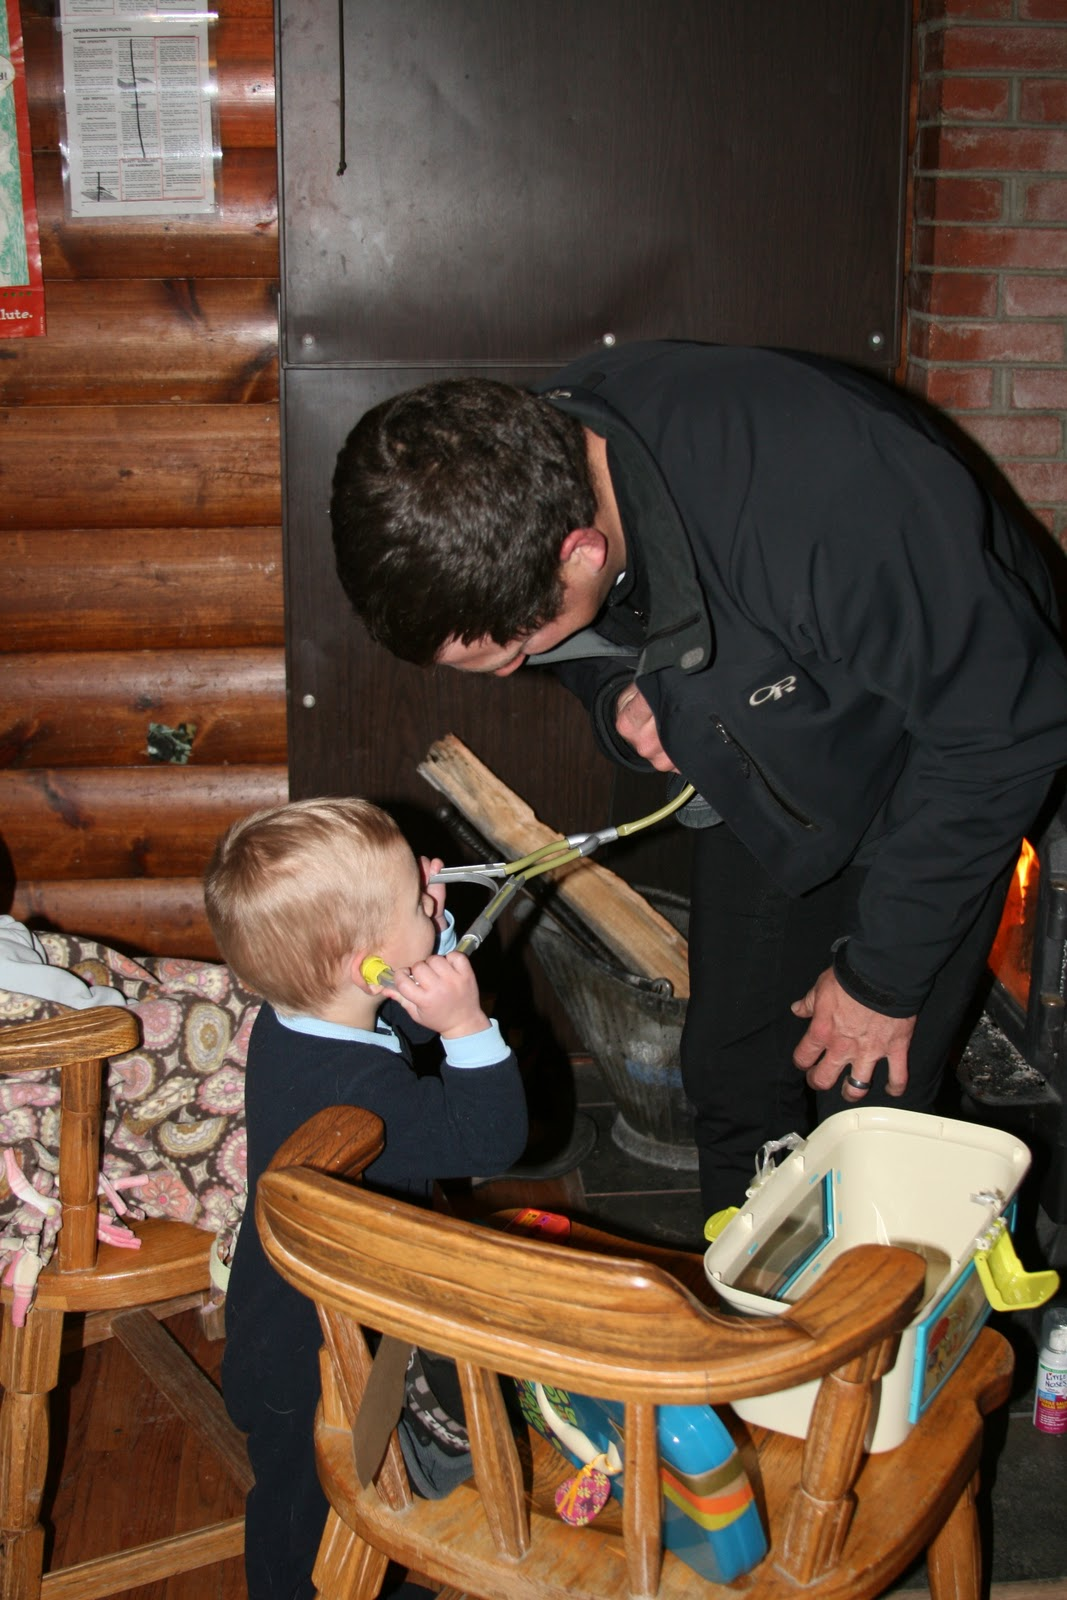 Sofa Ski School Review Pottery Barn Denim Slipcovers Cabin Getaways St Nicholas And Toys Reviews Tales